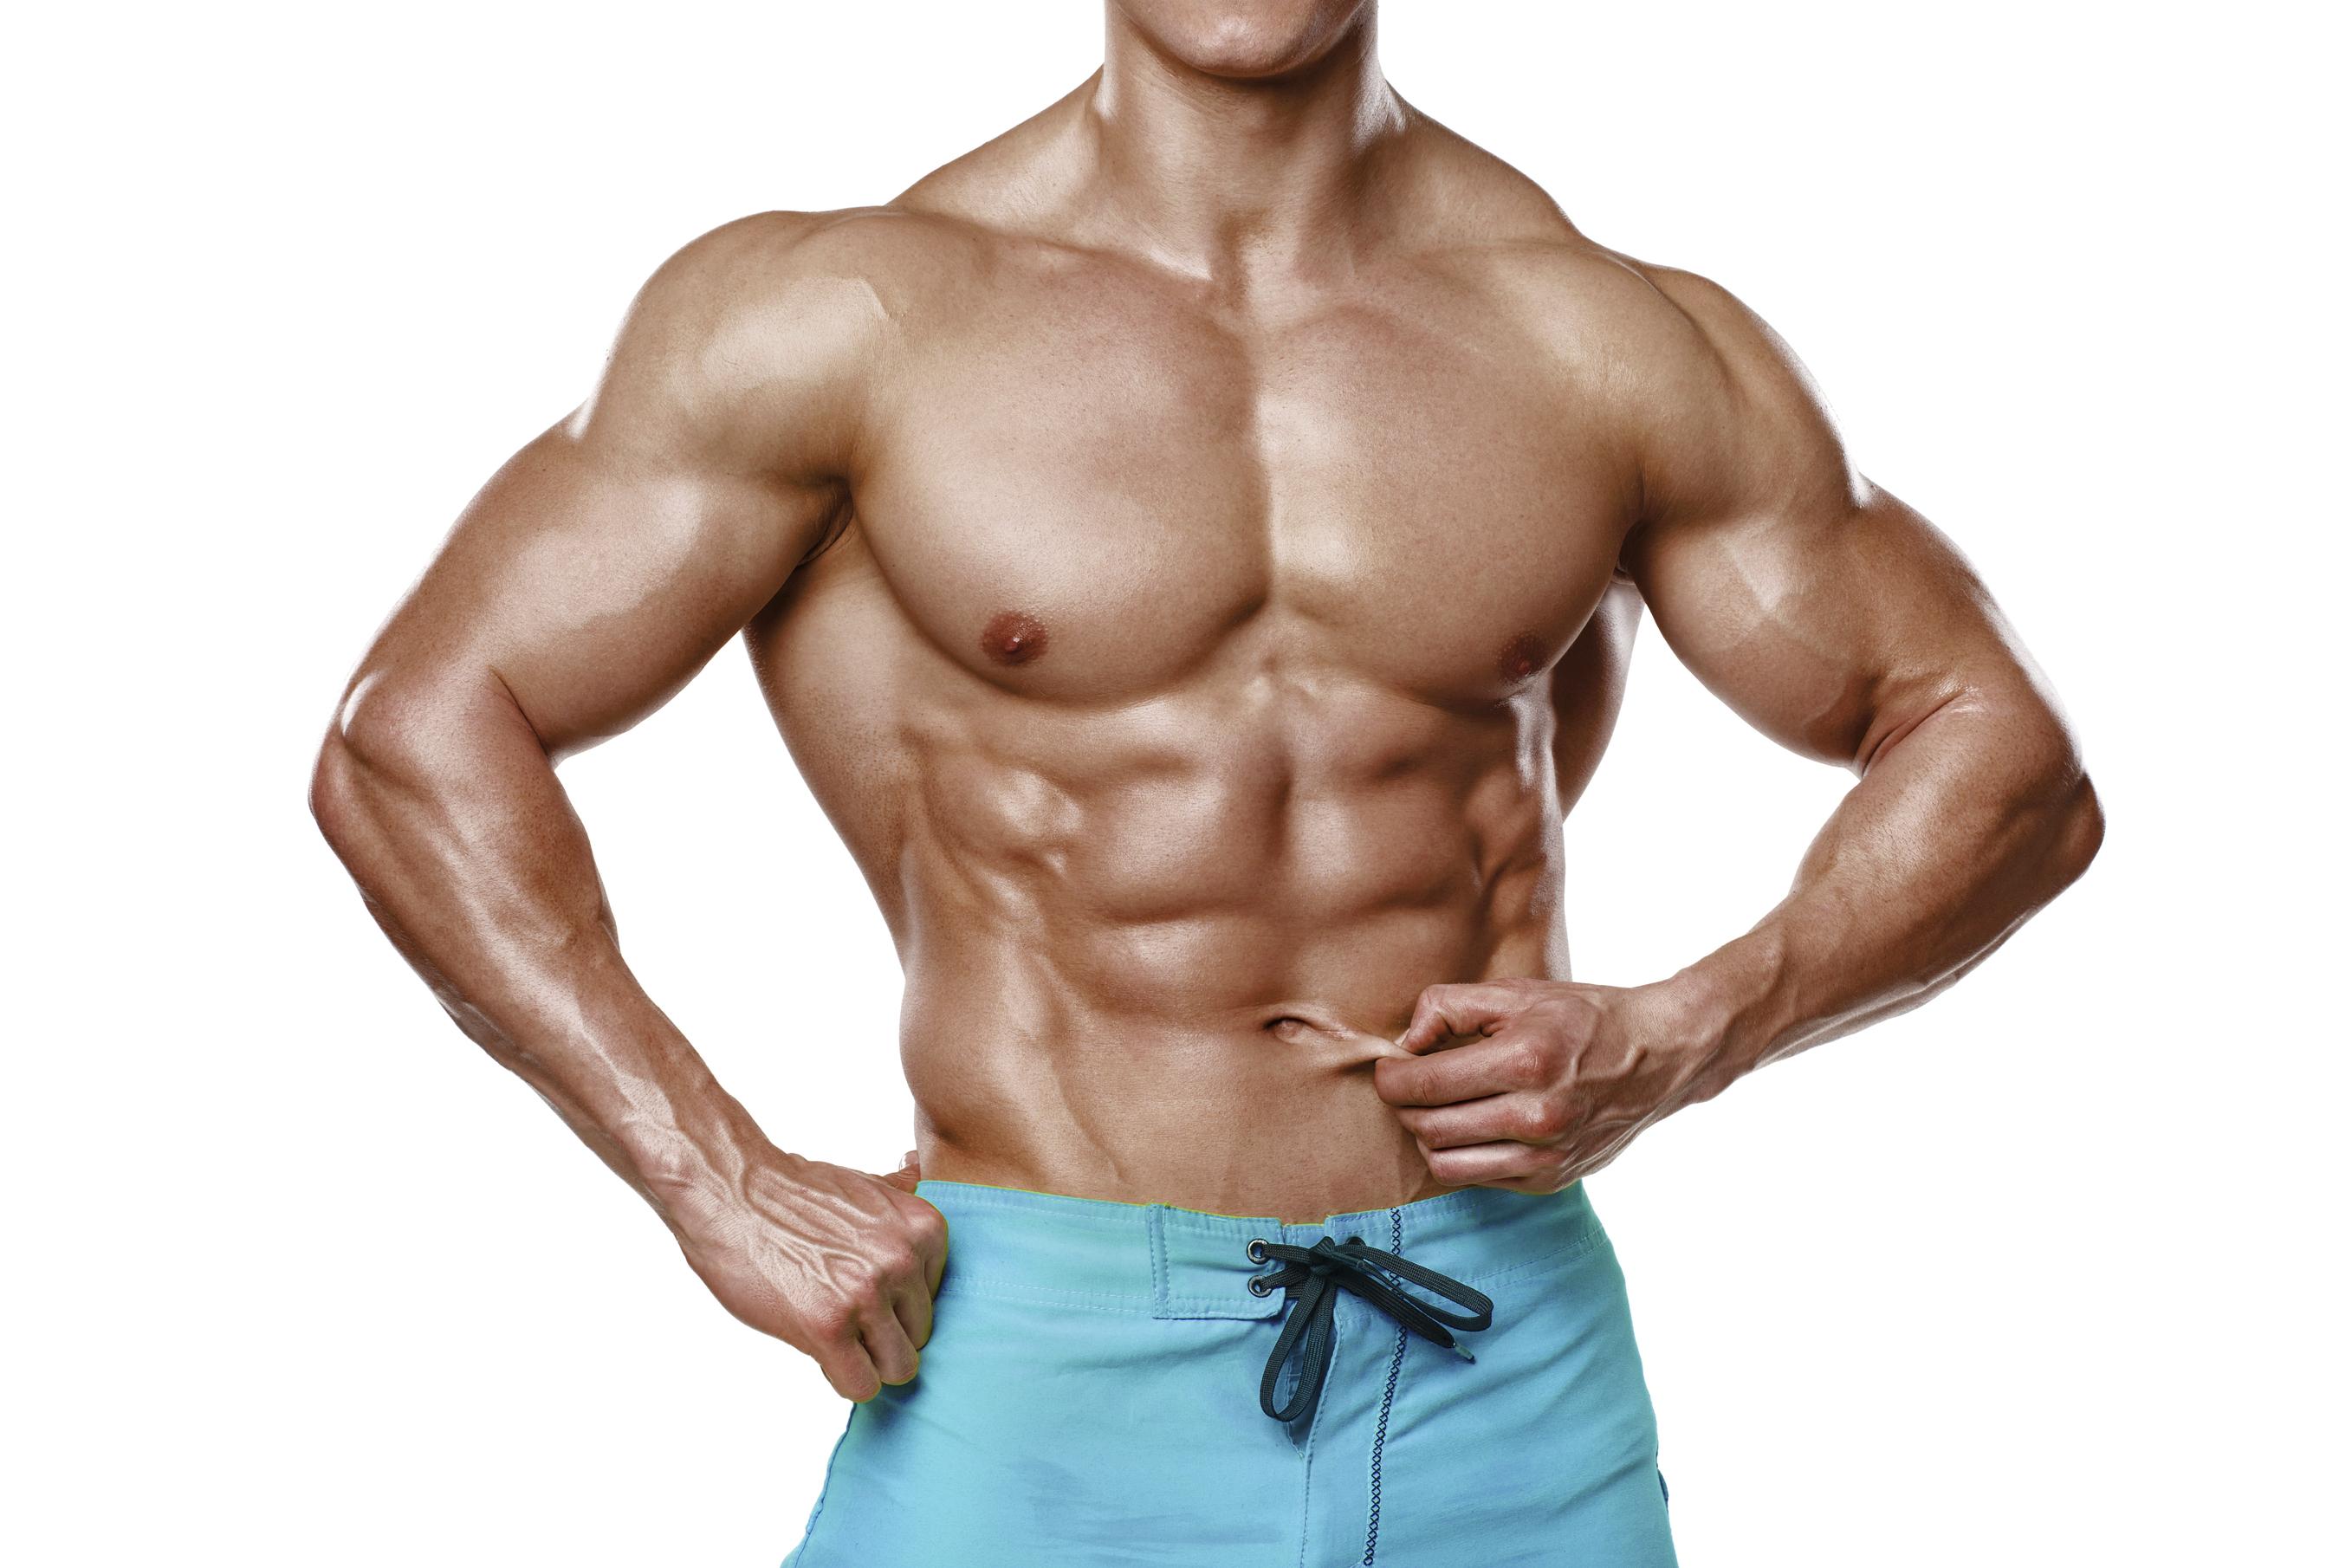 Dr. Tom Talks Intermittent Fasting, Ketogenic Diets & More! - Official Website of Joe DeFranco ...